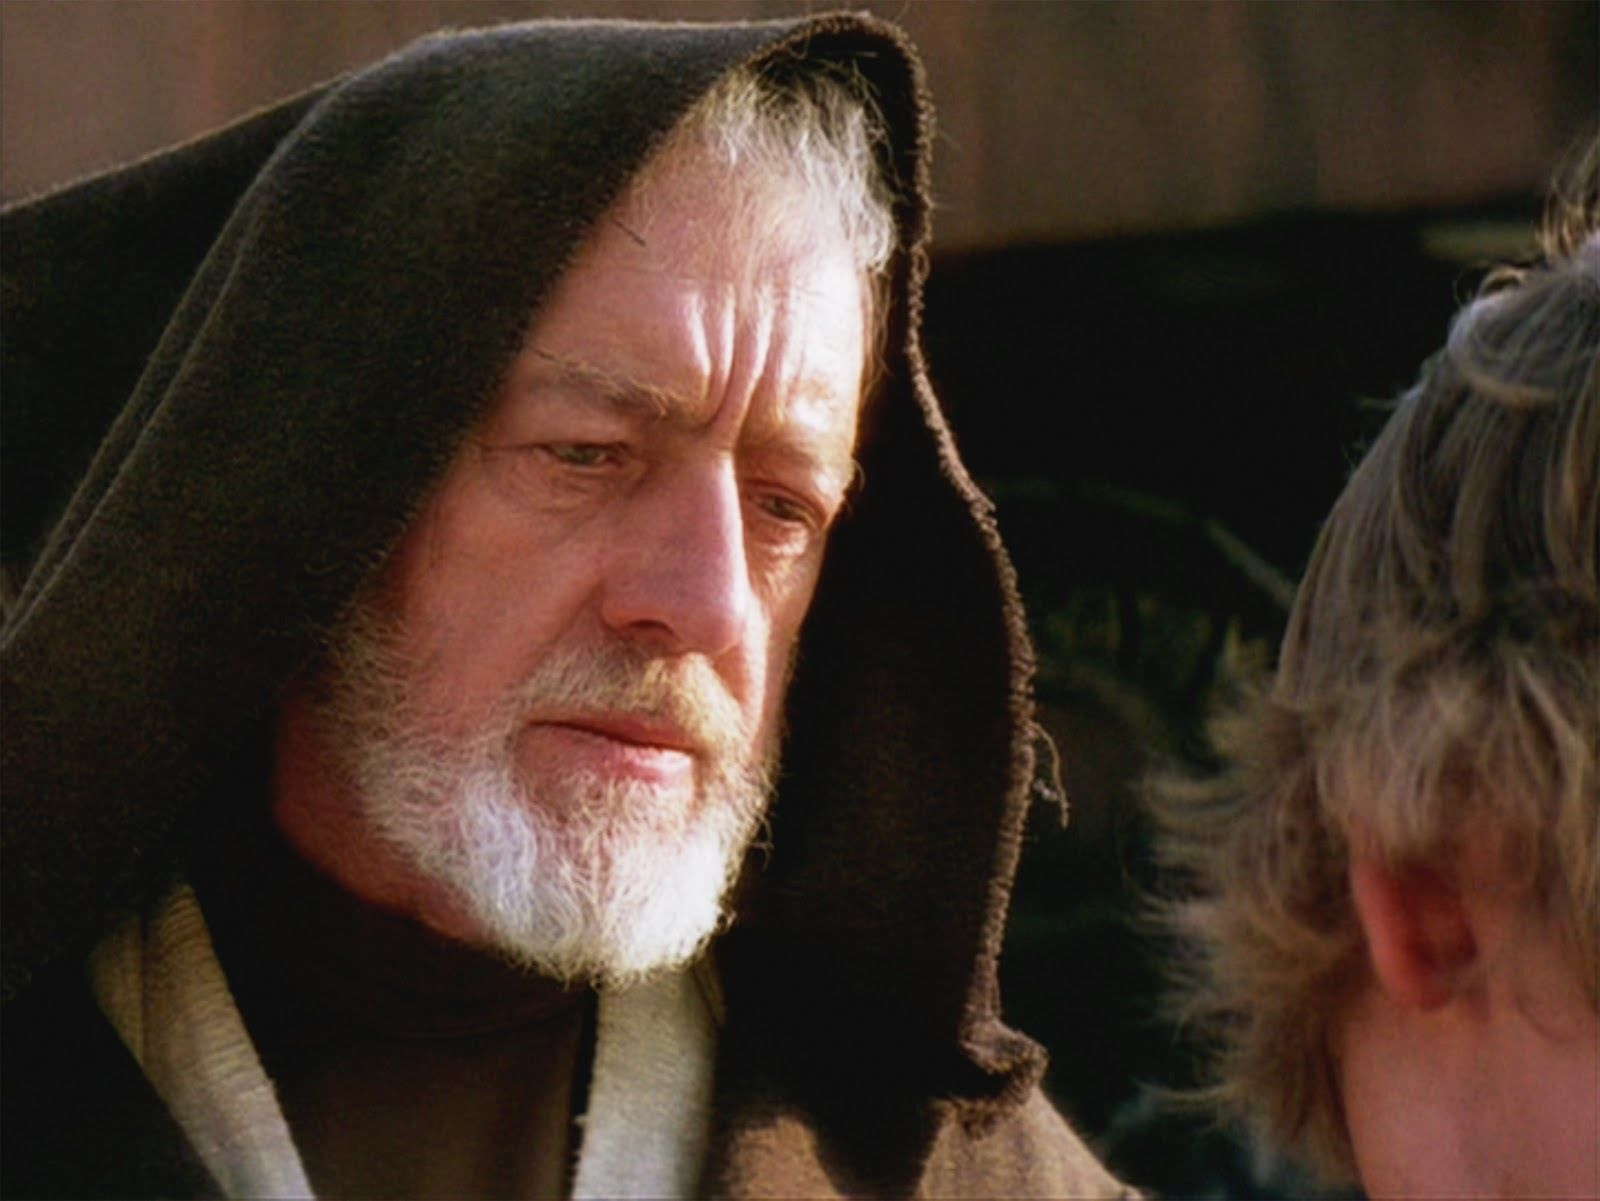 Obi-Wan sobrevive a la Gran Purga Jedi pero, ¿dónde se exilia?